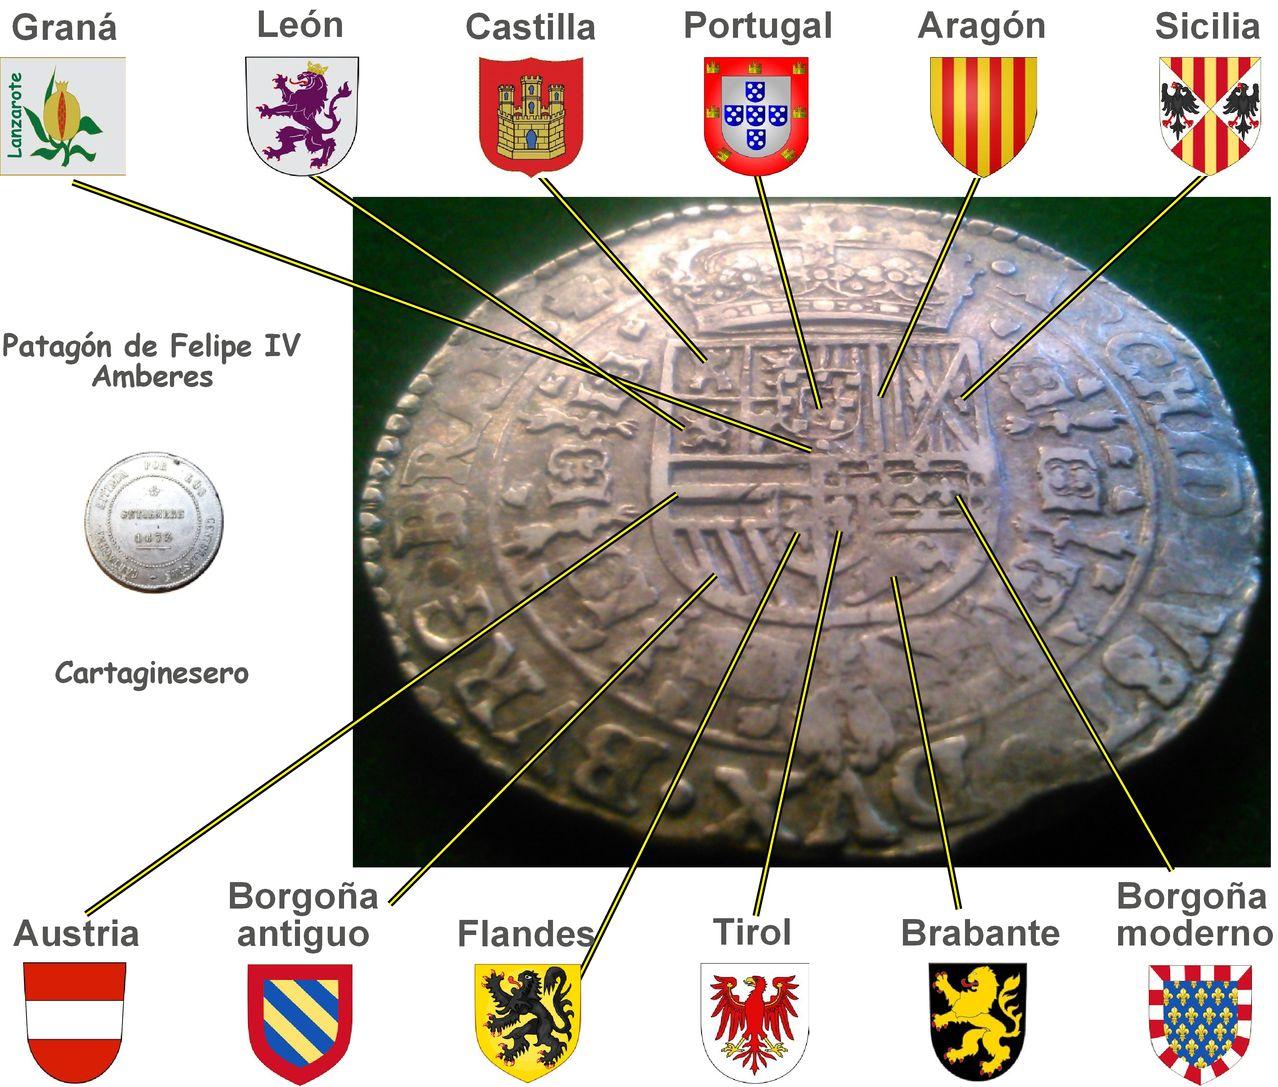 1 Patagón. Felipe IV 1654 Amberes. Dedicada a Lanzarote Clipboard02